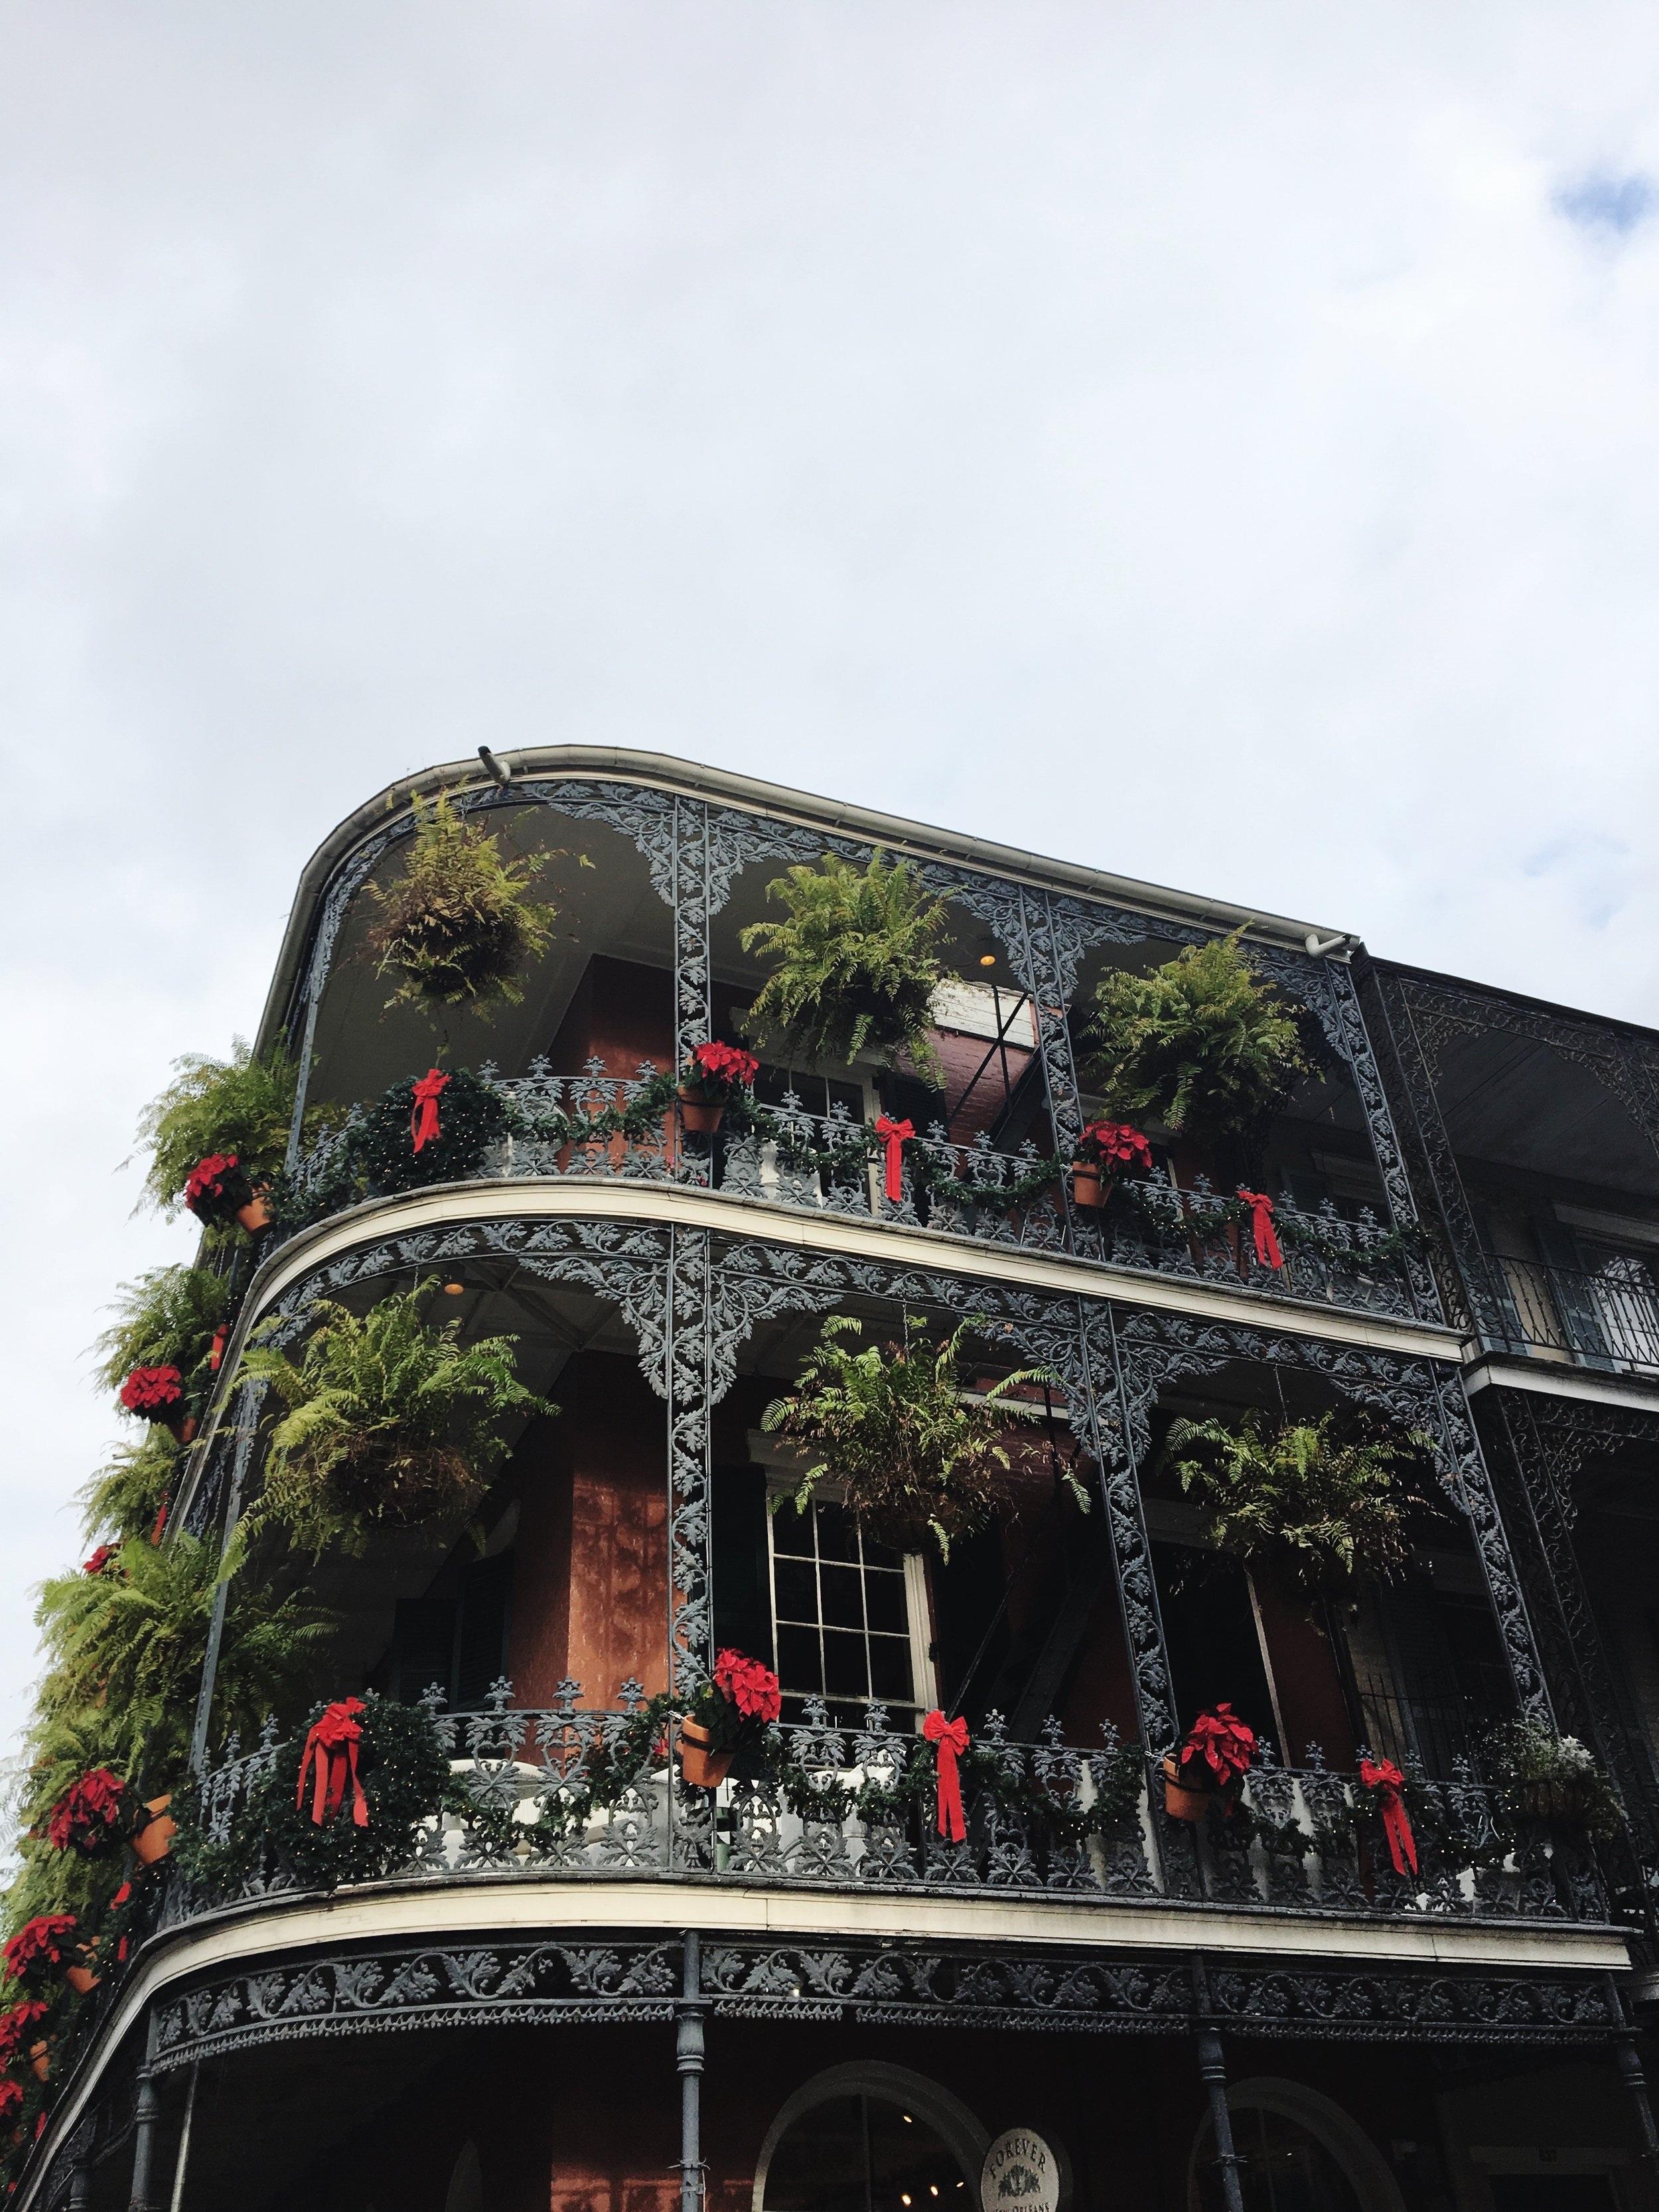 New Orleans: December 2016